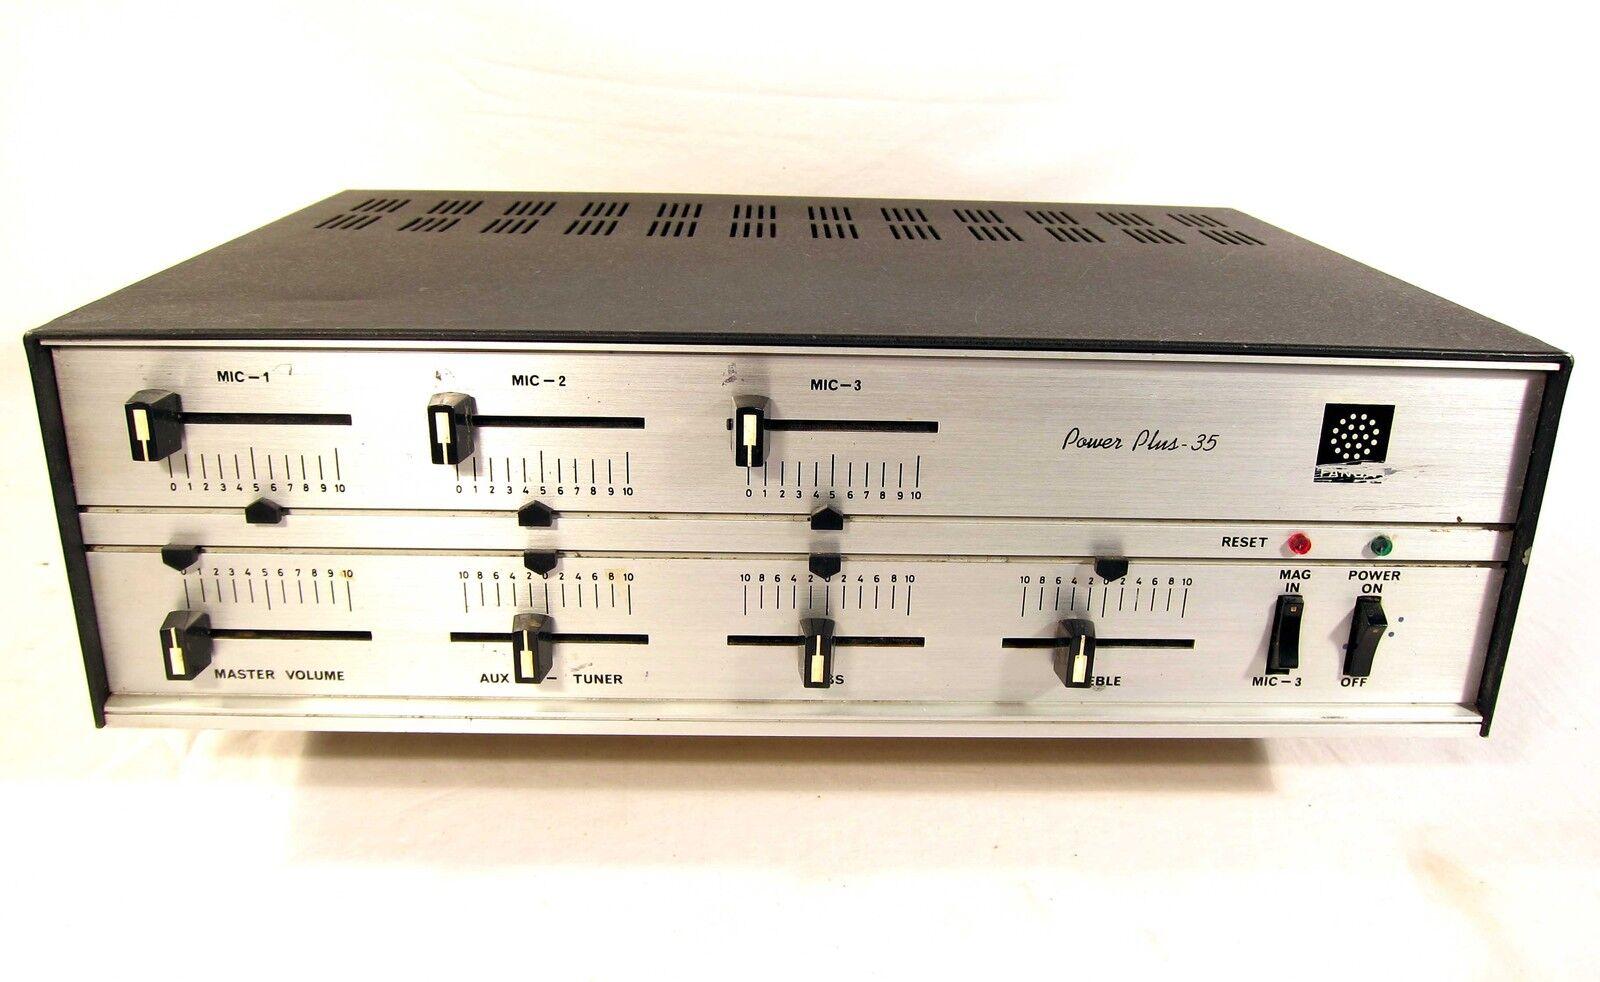 Vintage Fanon Power Plus 35 PA Amplifier Amp Mixer WORKING NICE